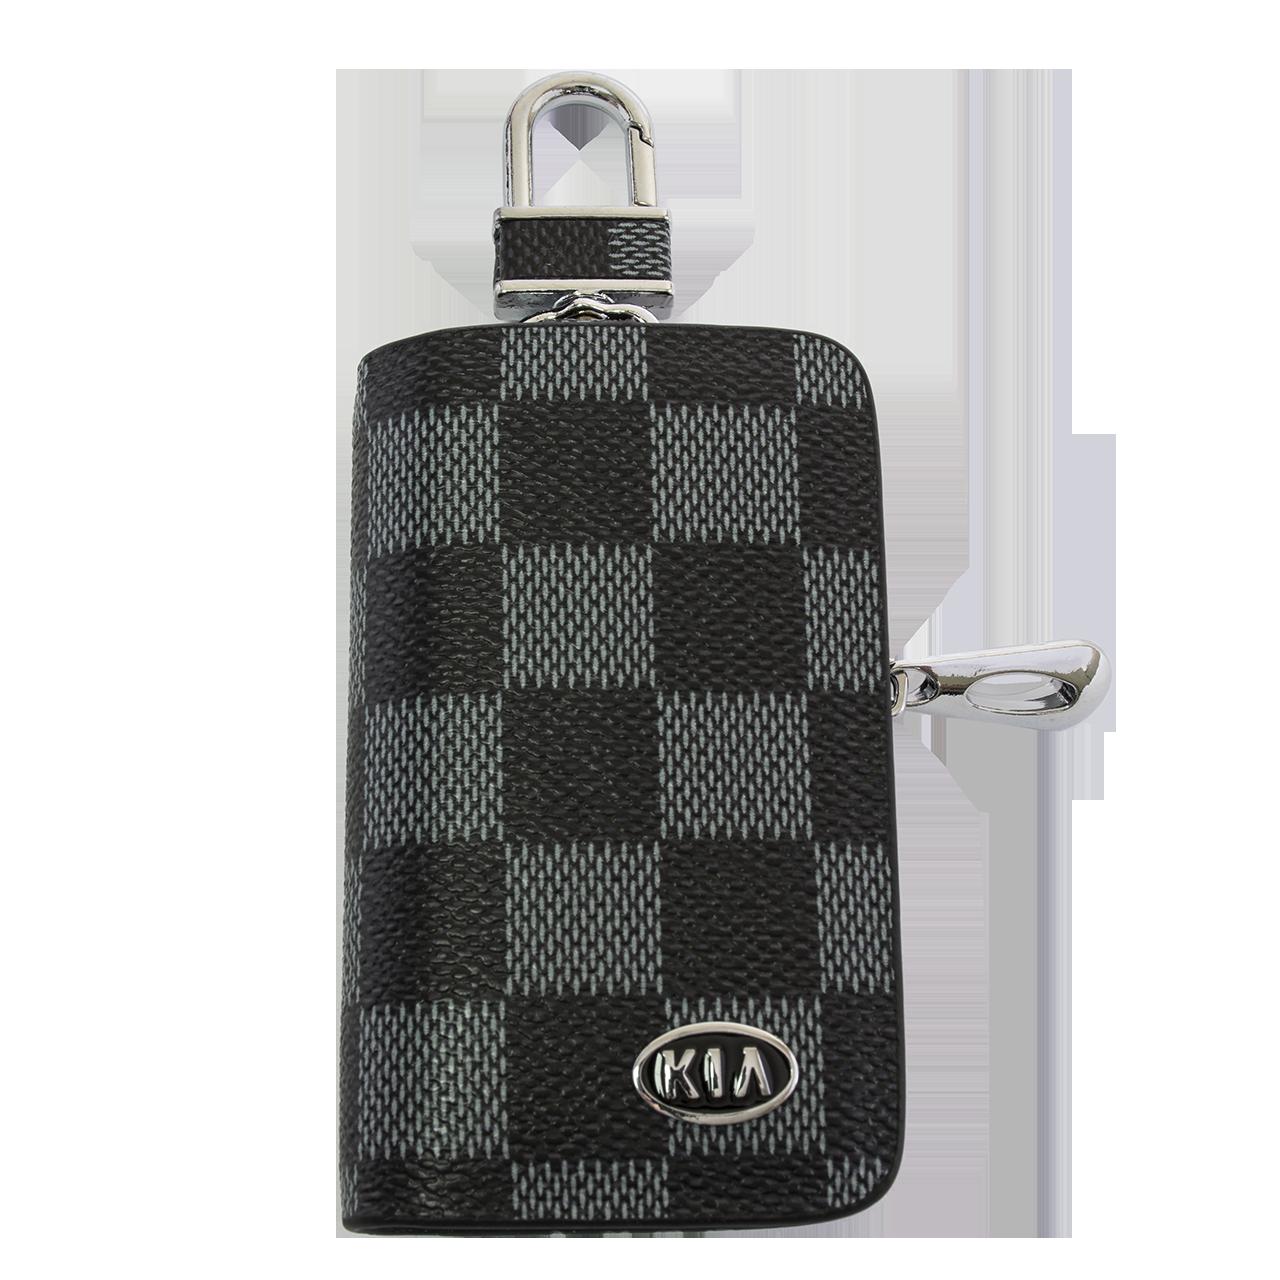 Ключница Carss с логотипом KIA 05013 карбон серый